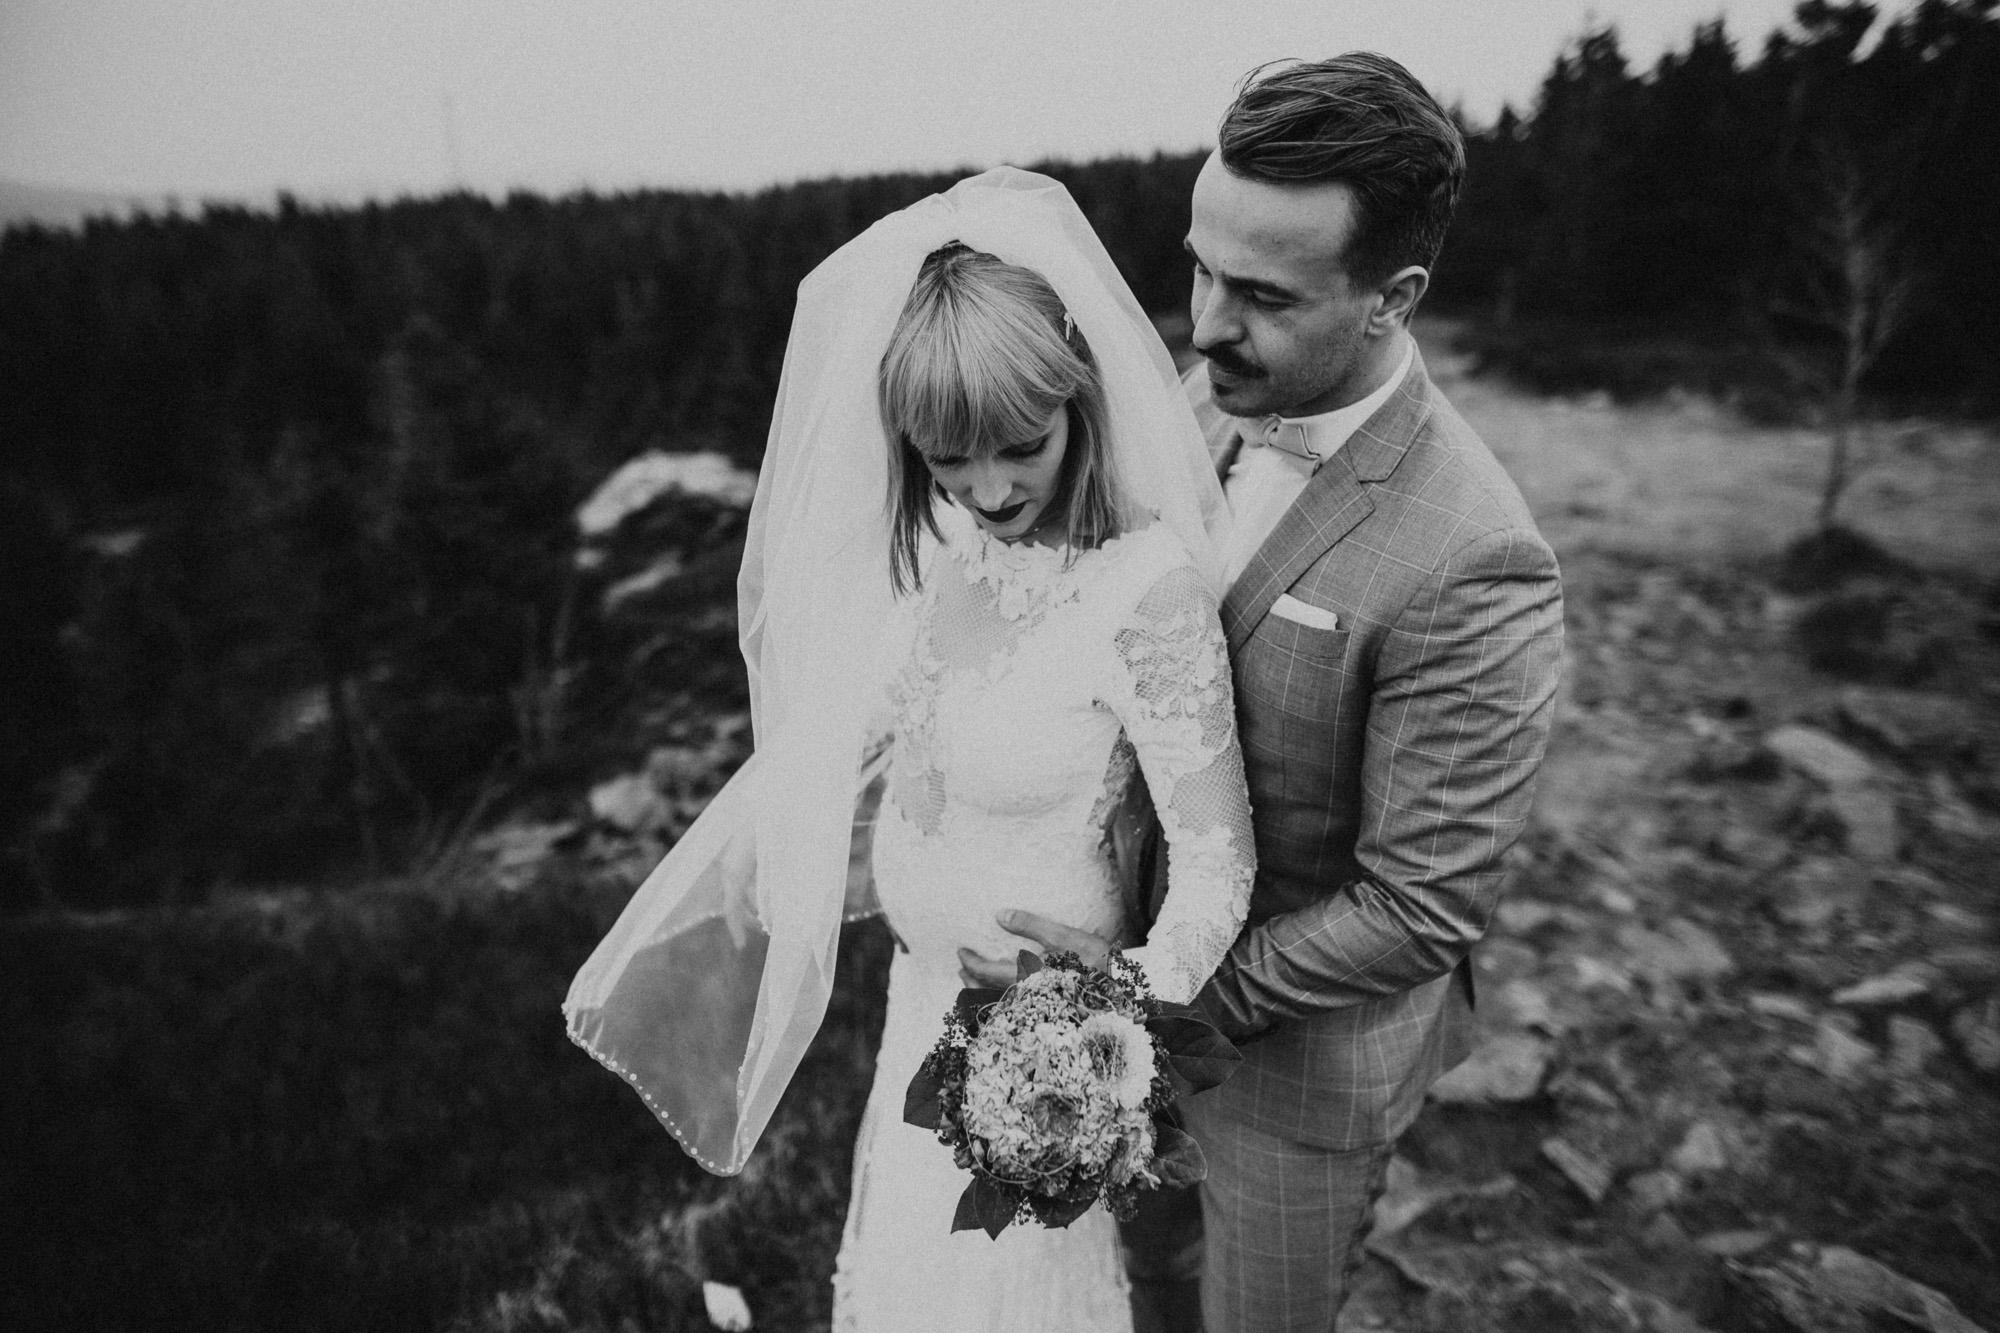 DanielaMarquardtPhotography_Hochzeitsfotograf_Düsseldorf_Köln_Mallorca_Bayern_Austria_Harz_LinaundMaik_Afterwedding-Shooting_Weddingphotographer_Ibiza_Tuskany_Italien_Toskana38